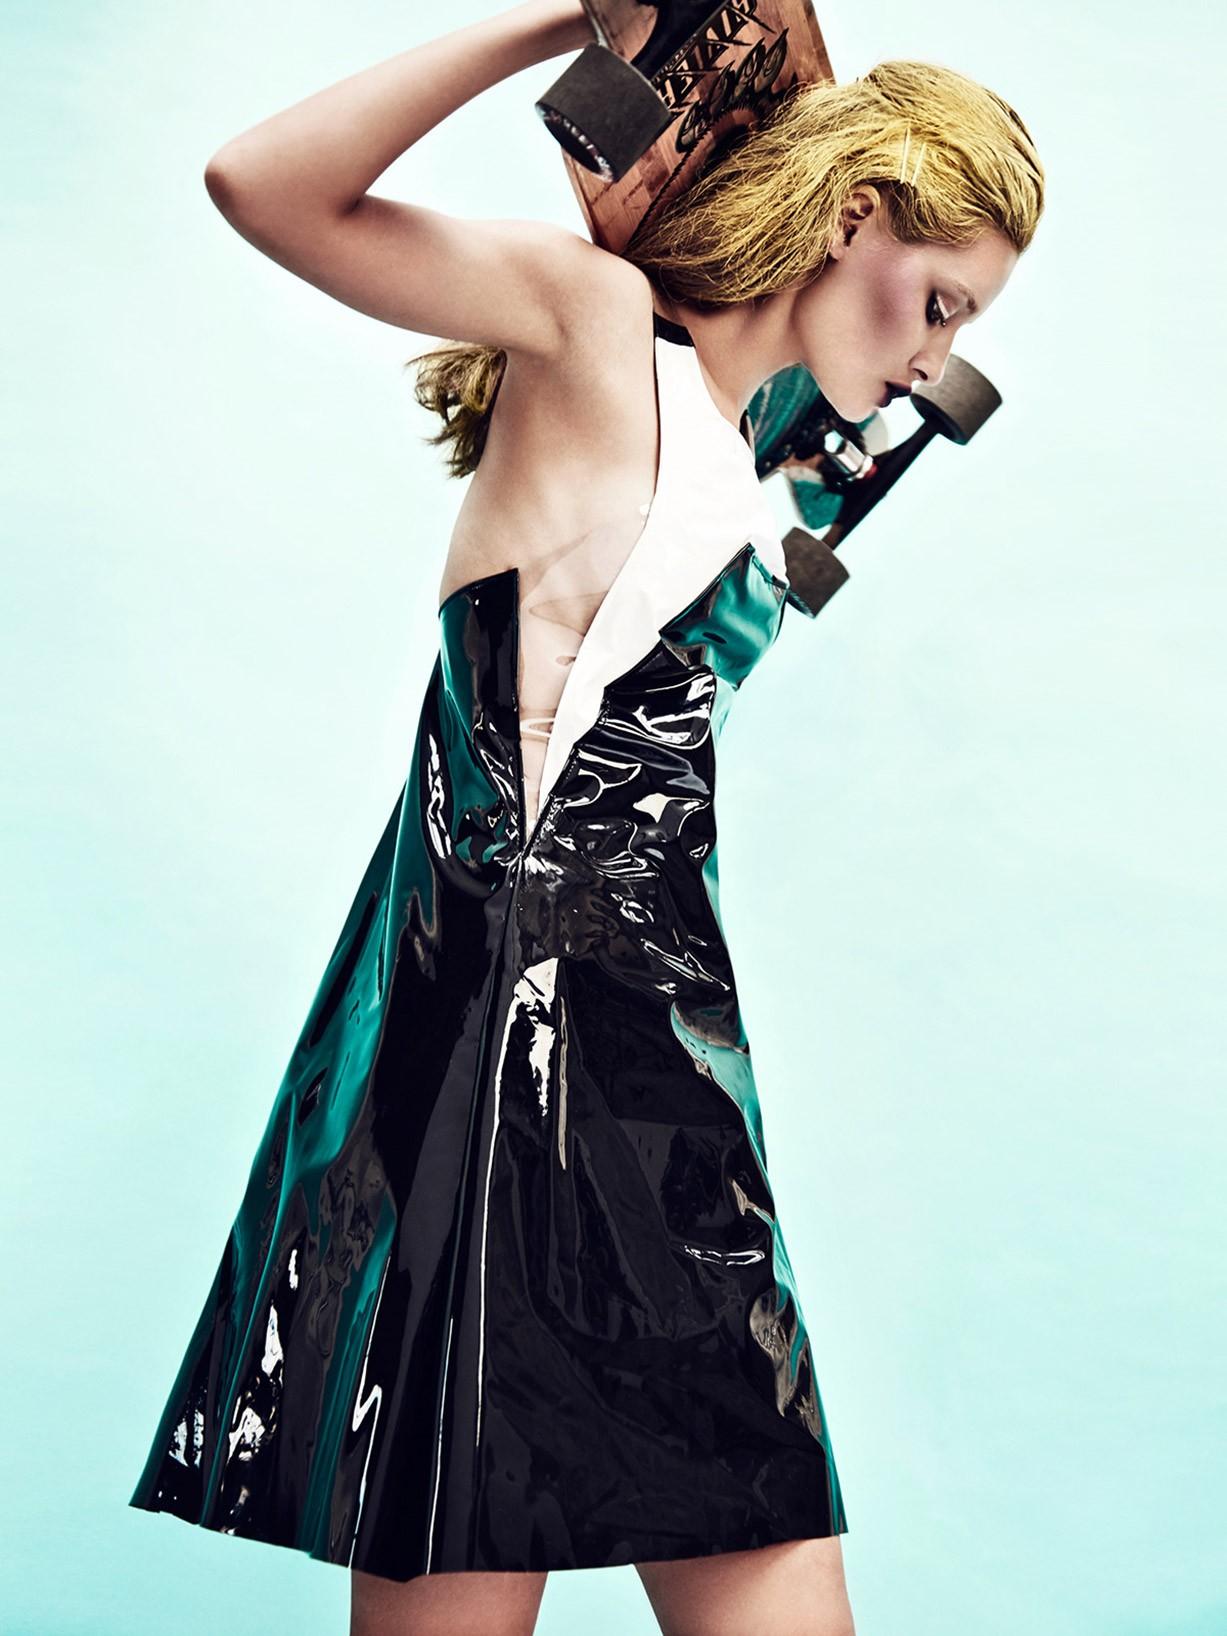 Лиза Сотникова в мире пластиковых душ / Liza Sotnikova by Evgeniy Kuznetsov - The Superior Magazine july 2015